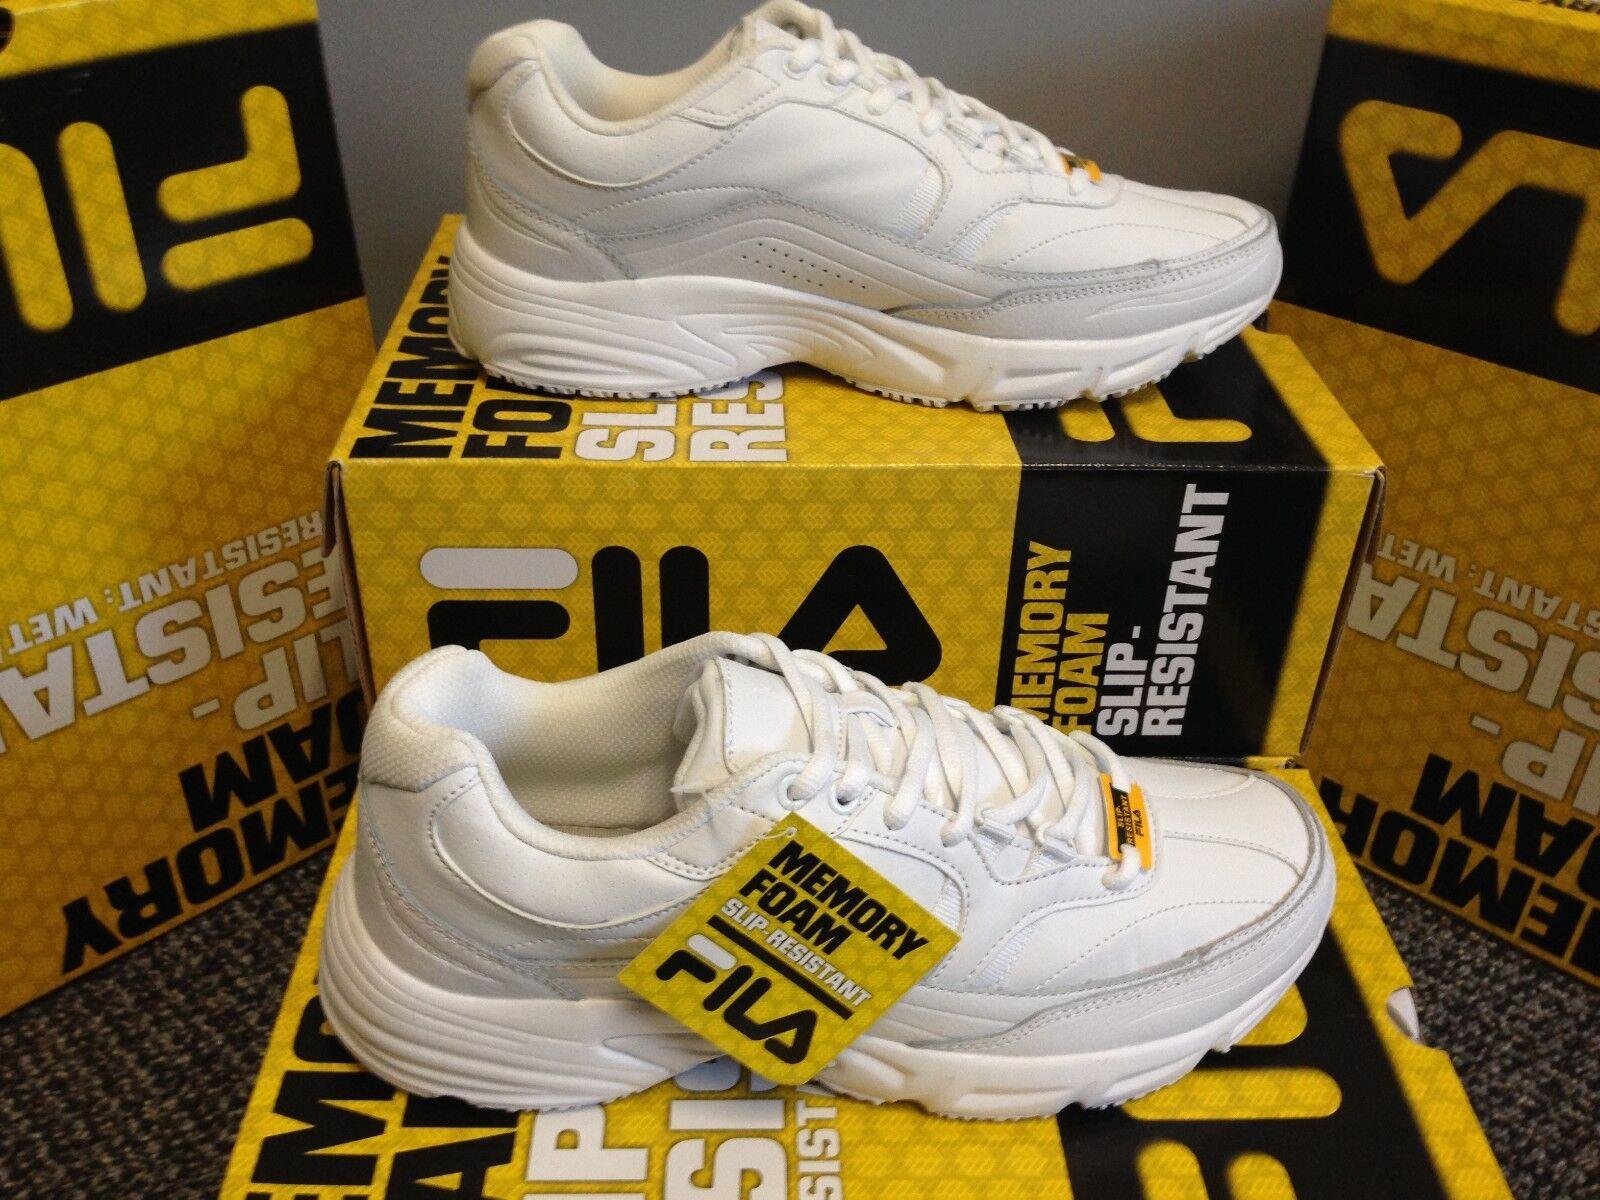 FILA Mens Memory Workshift Slip Resistant Sneaker SG30002-100 All White Med New shoes for men and women, limited time discount